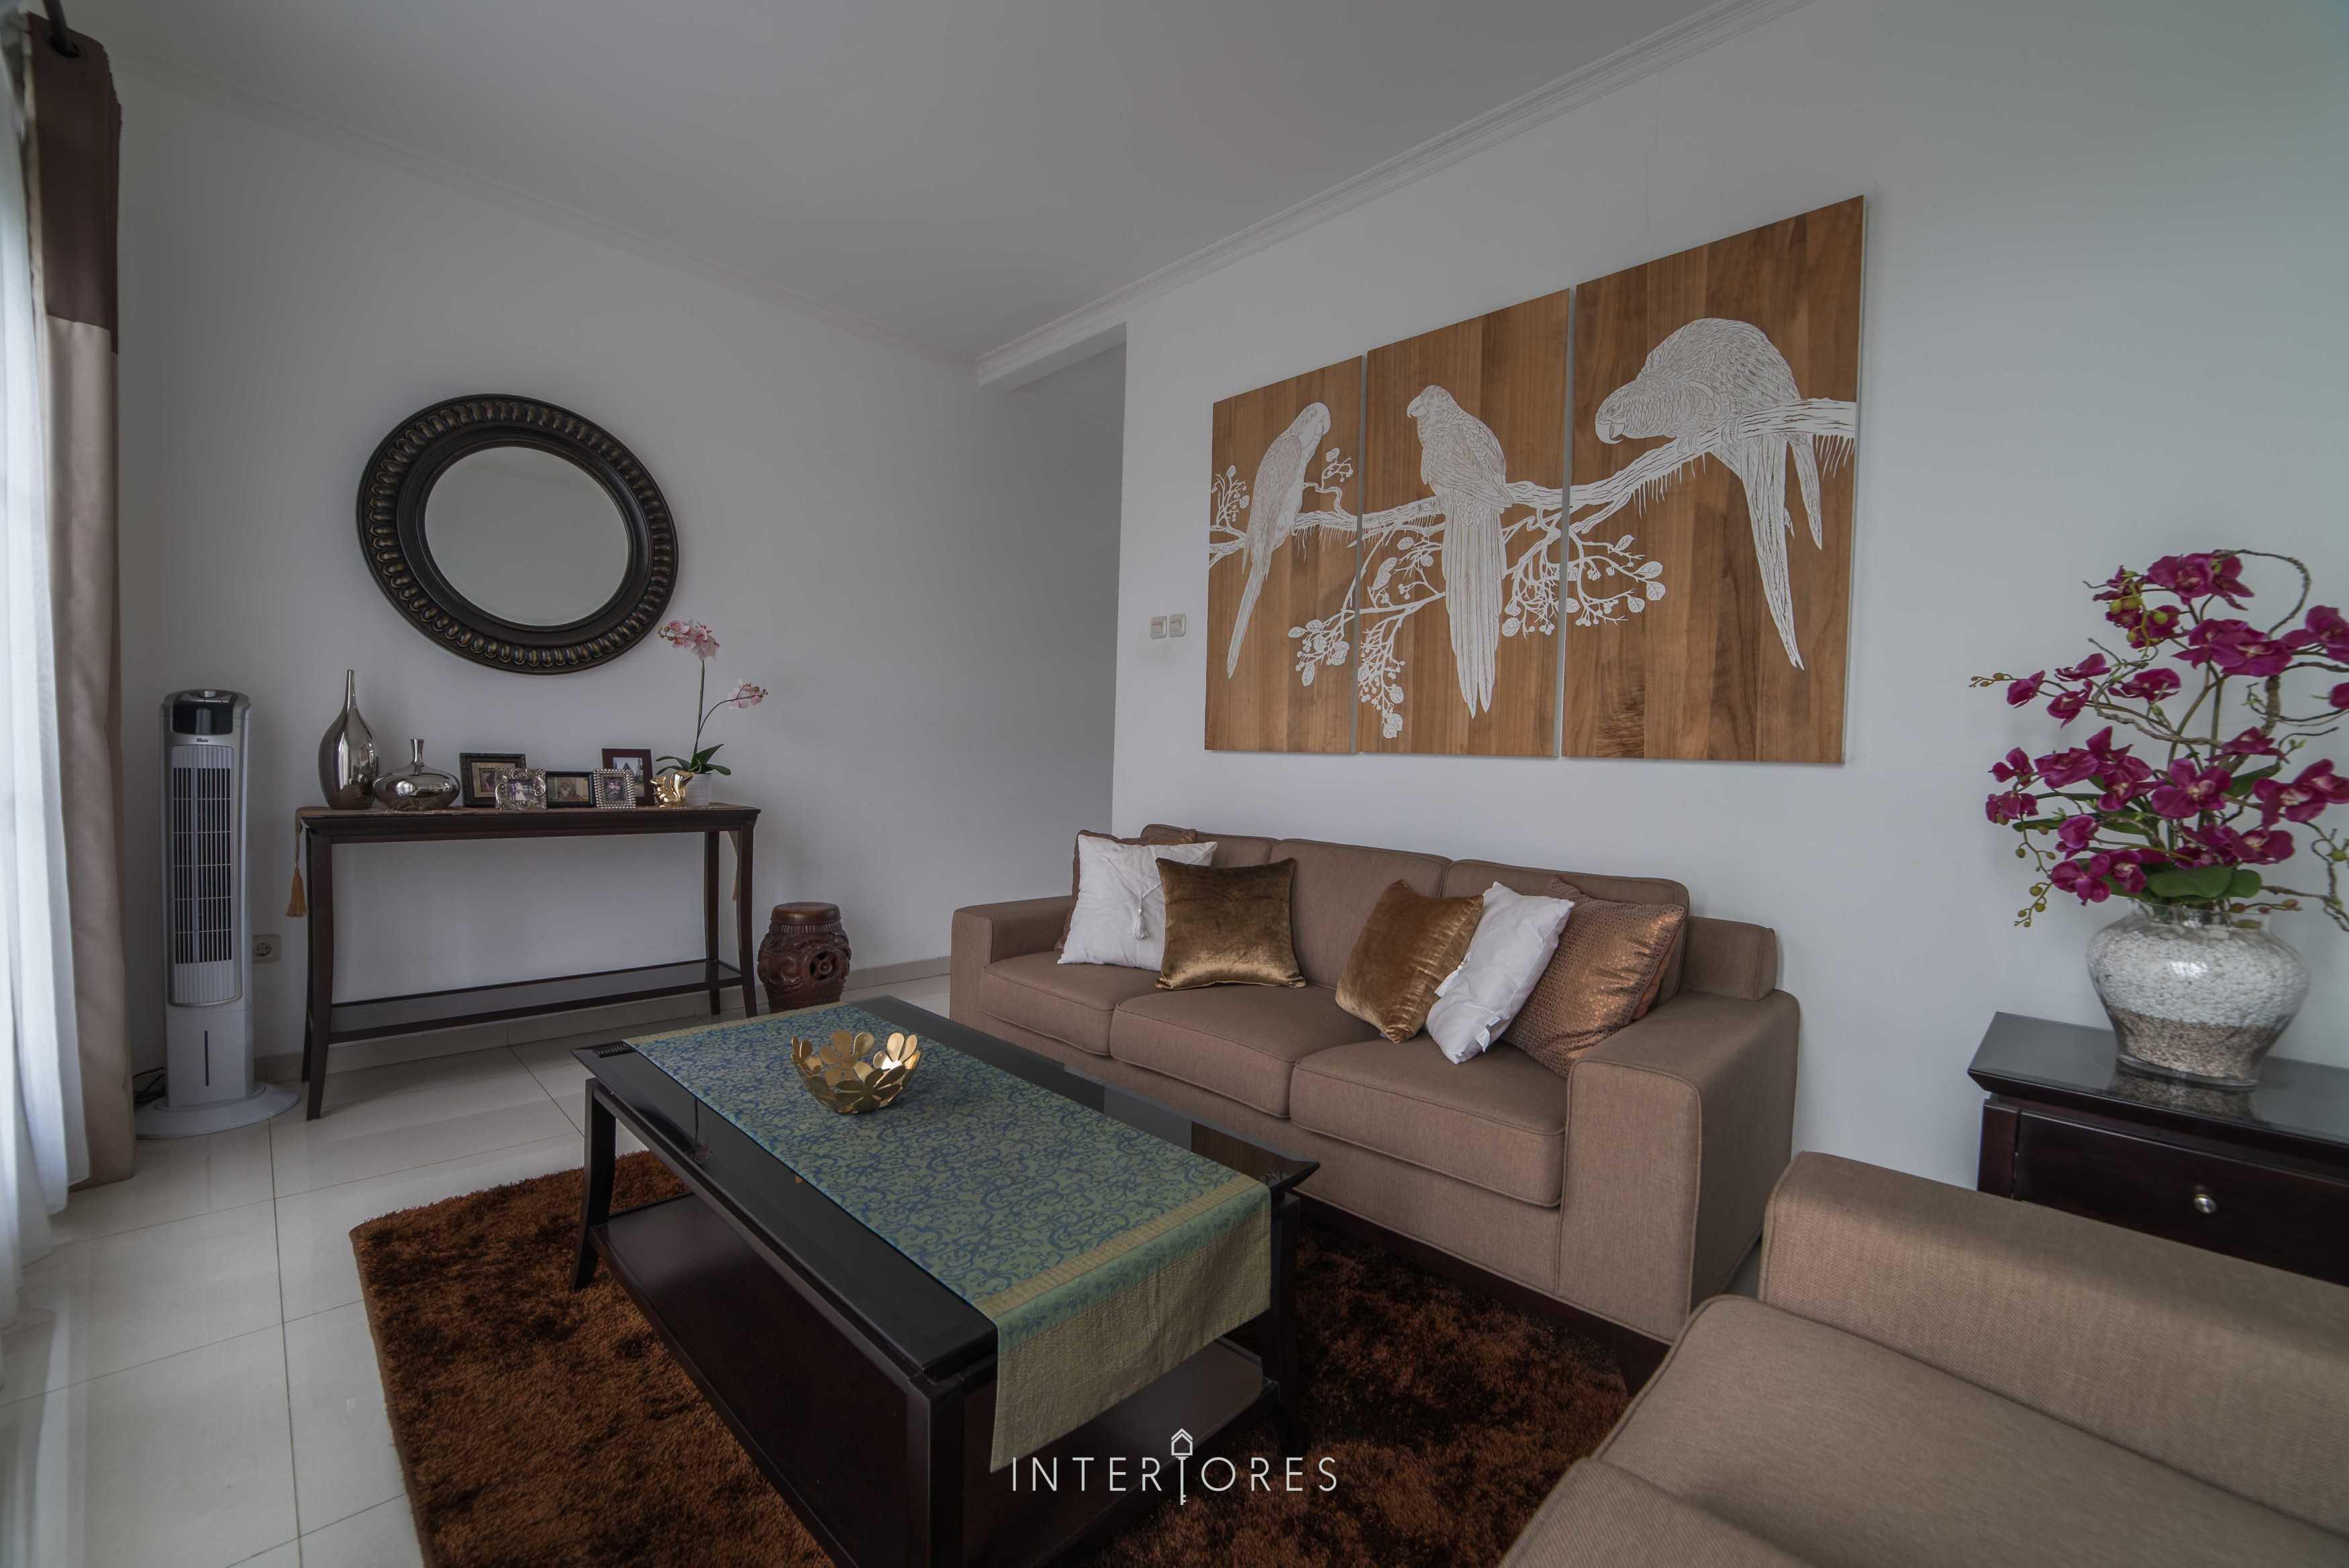 Interiores Interior Consultant & Build Greta 90 Bintaro Bintaro Guest Room Kontemporer  17666